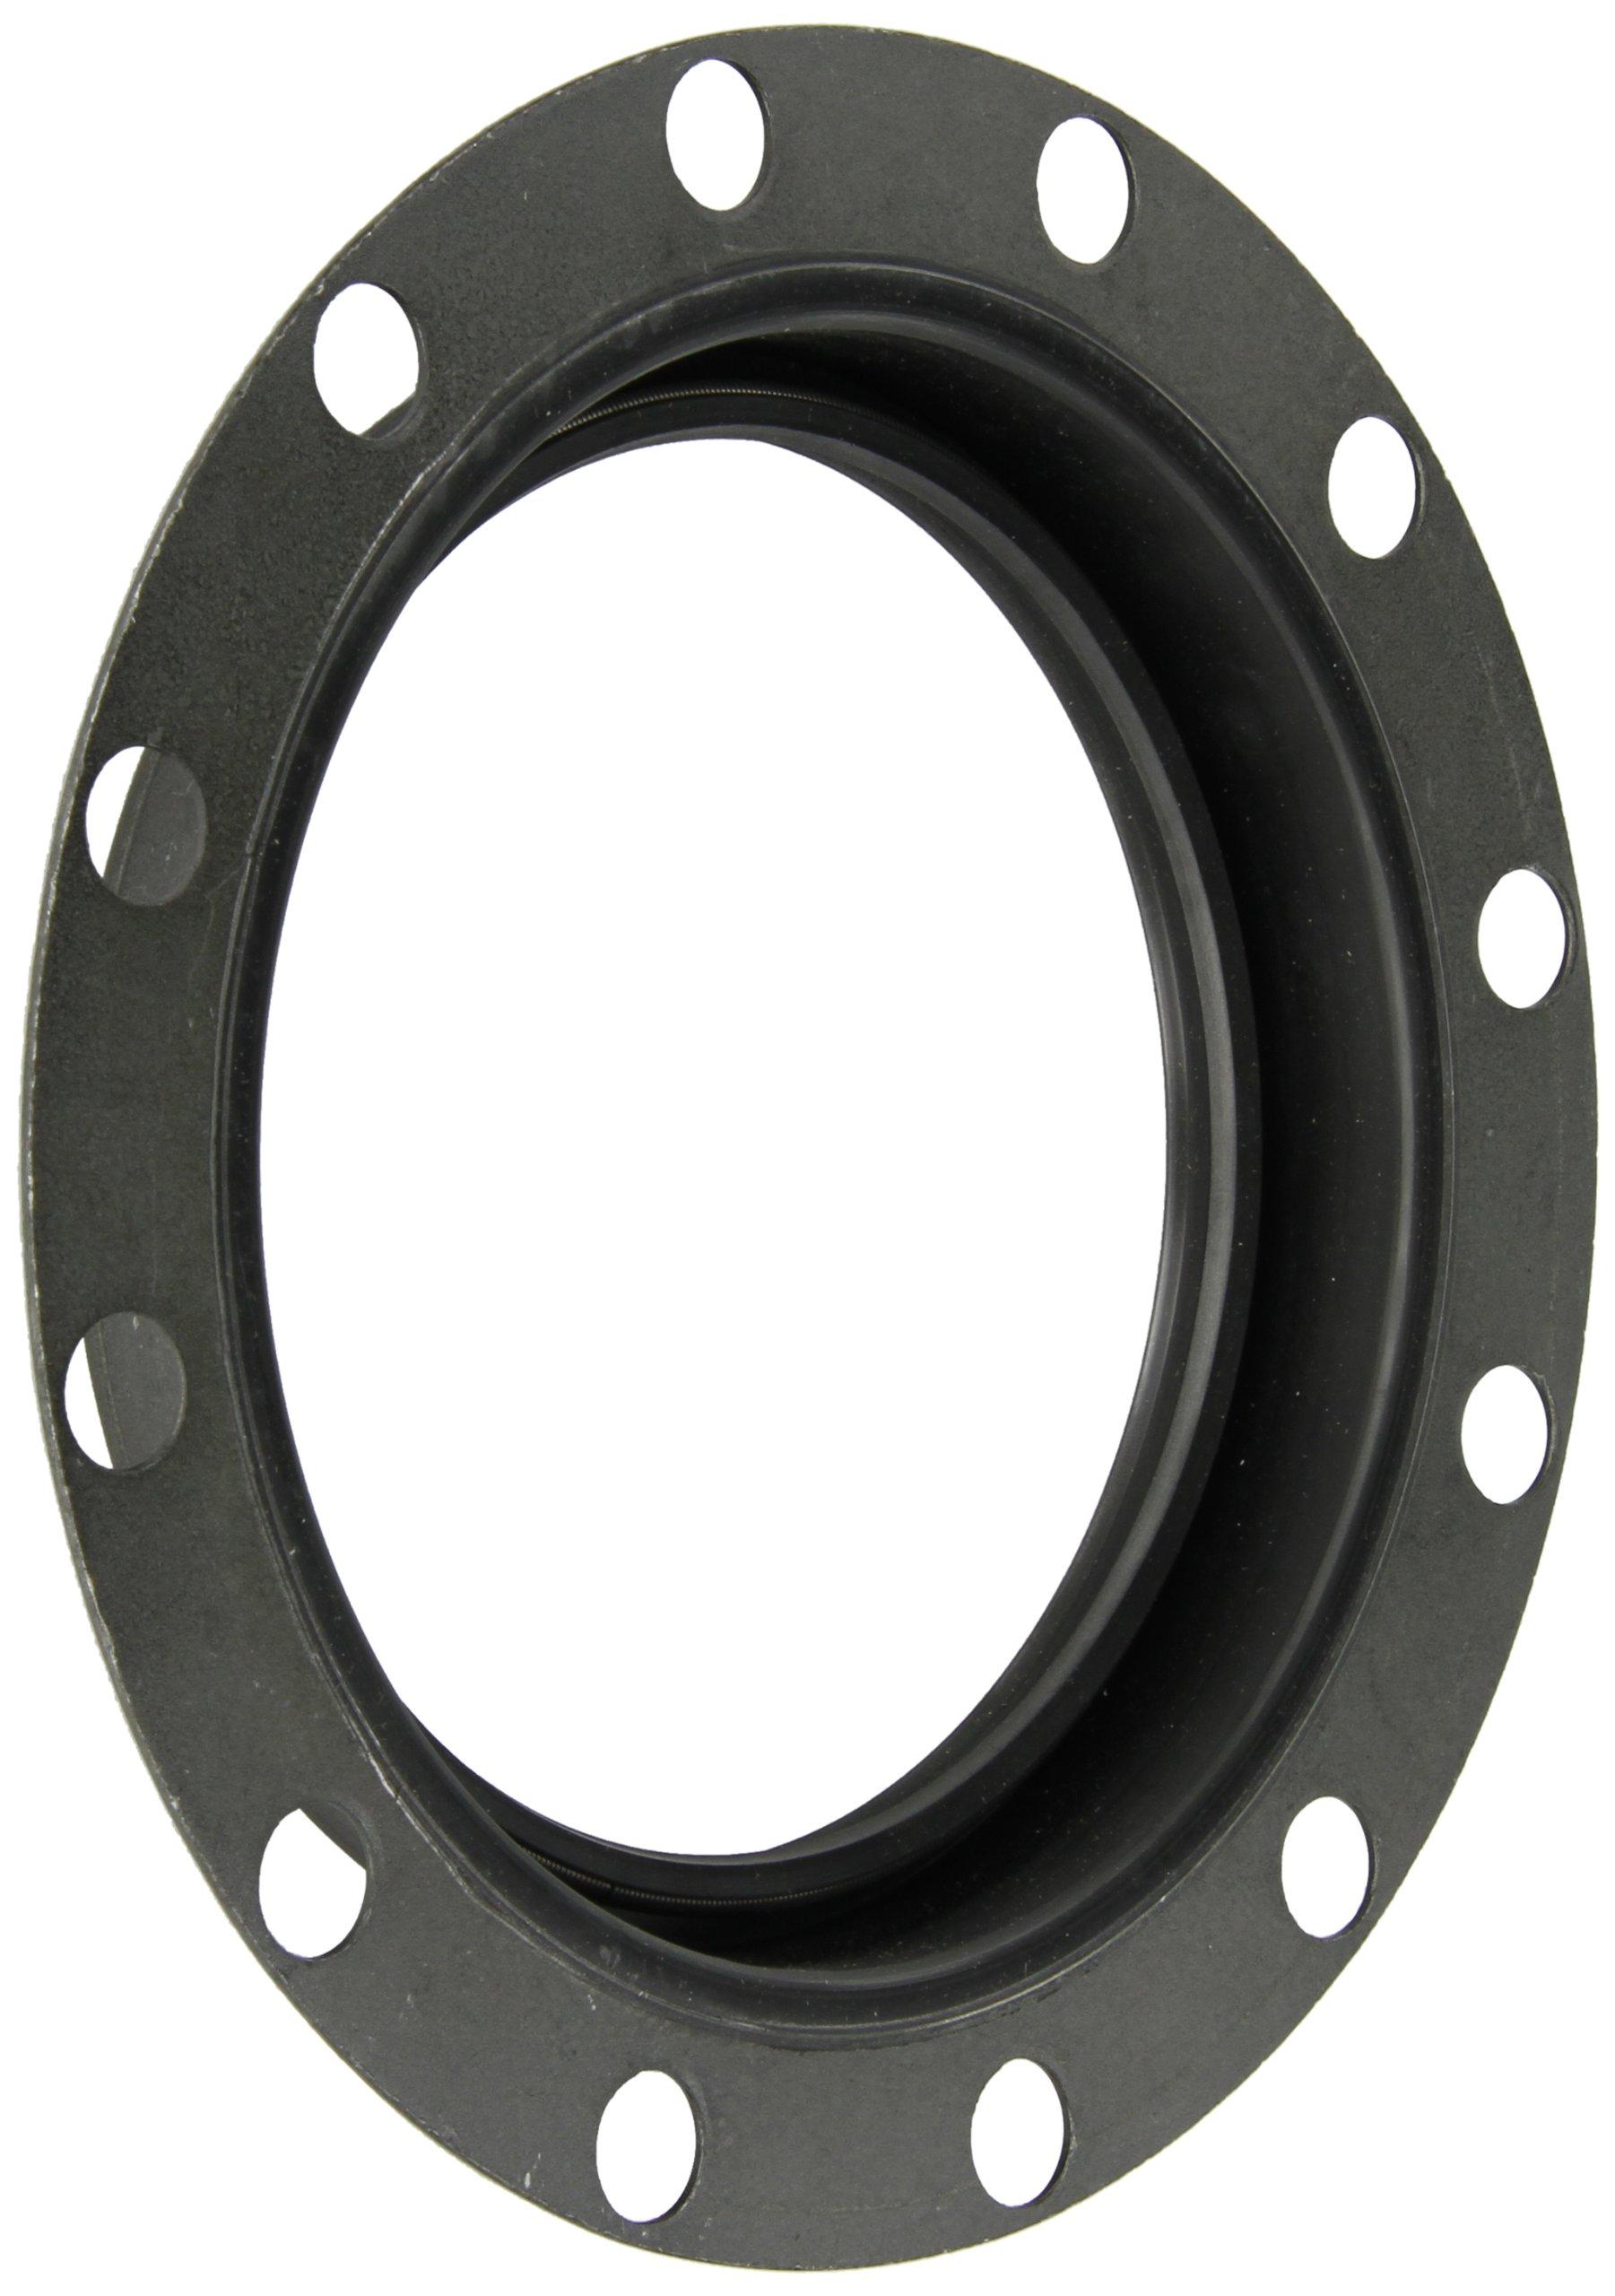 SKF 59380 LDS & Small Bore Seal, R Lip Code, J2 Style, Inch, 5.938'' Shaft Diameter, 6.801'' Bore Diameter, 1.125'' Width